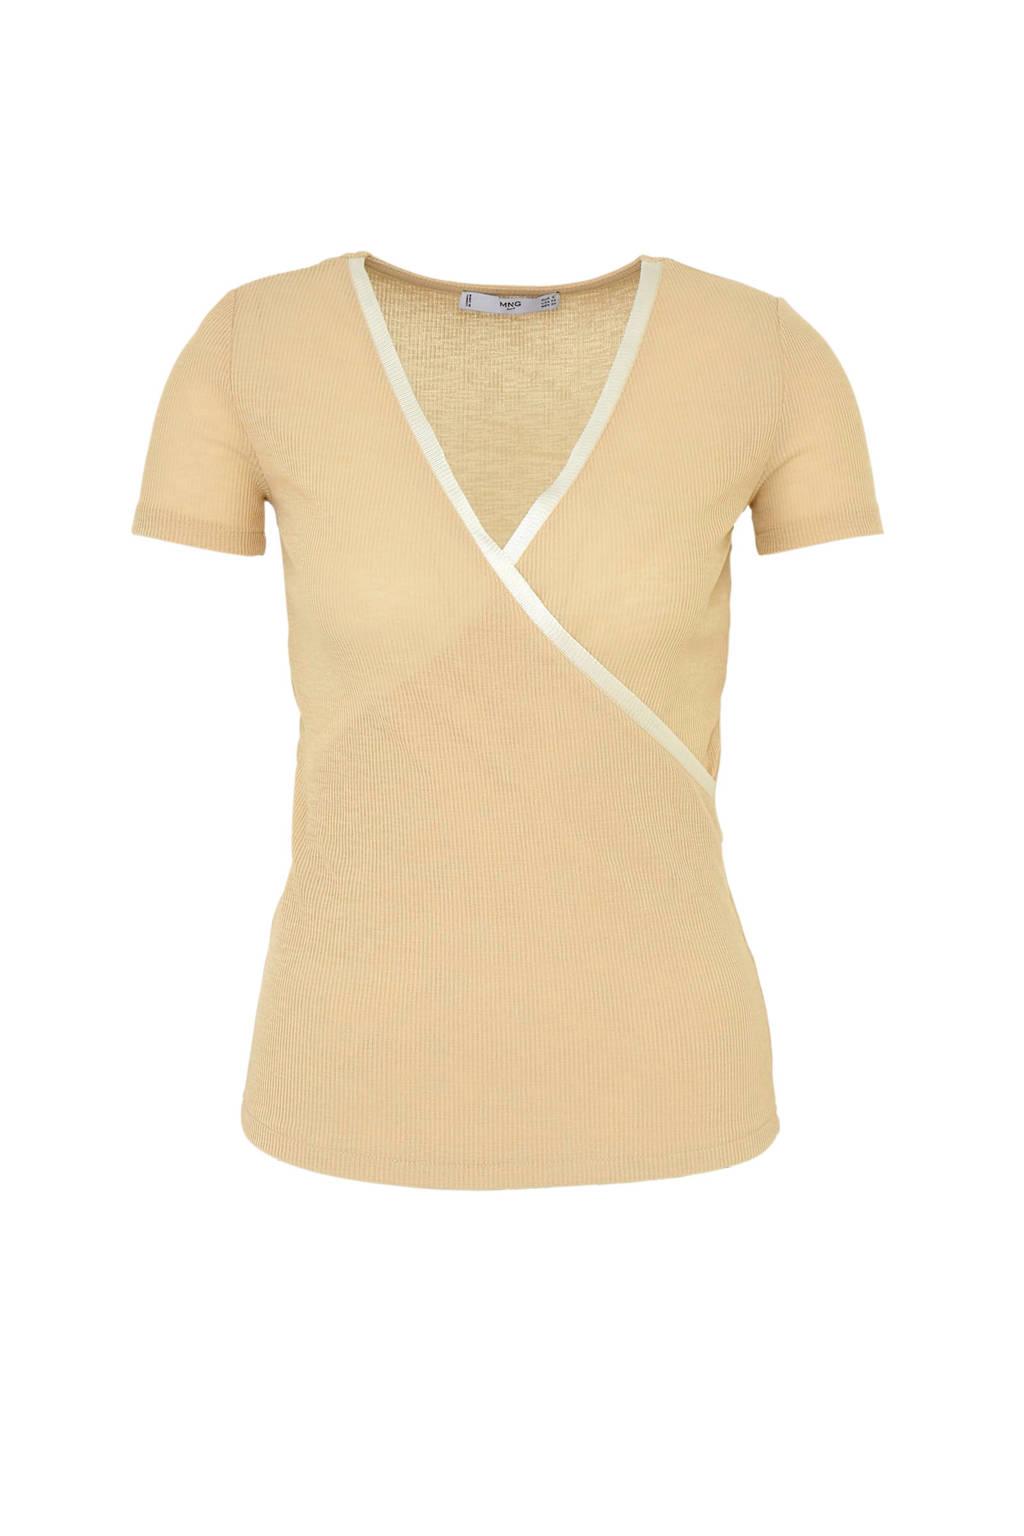 Mango T-shirt beige, Beige